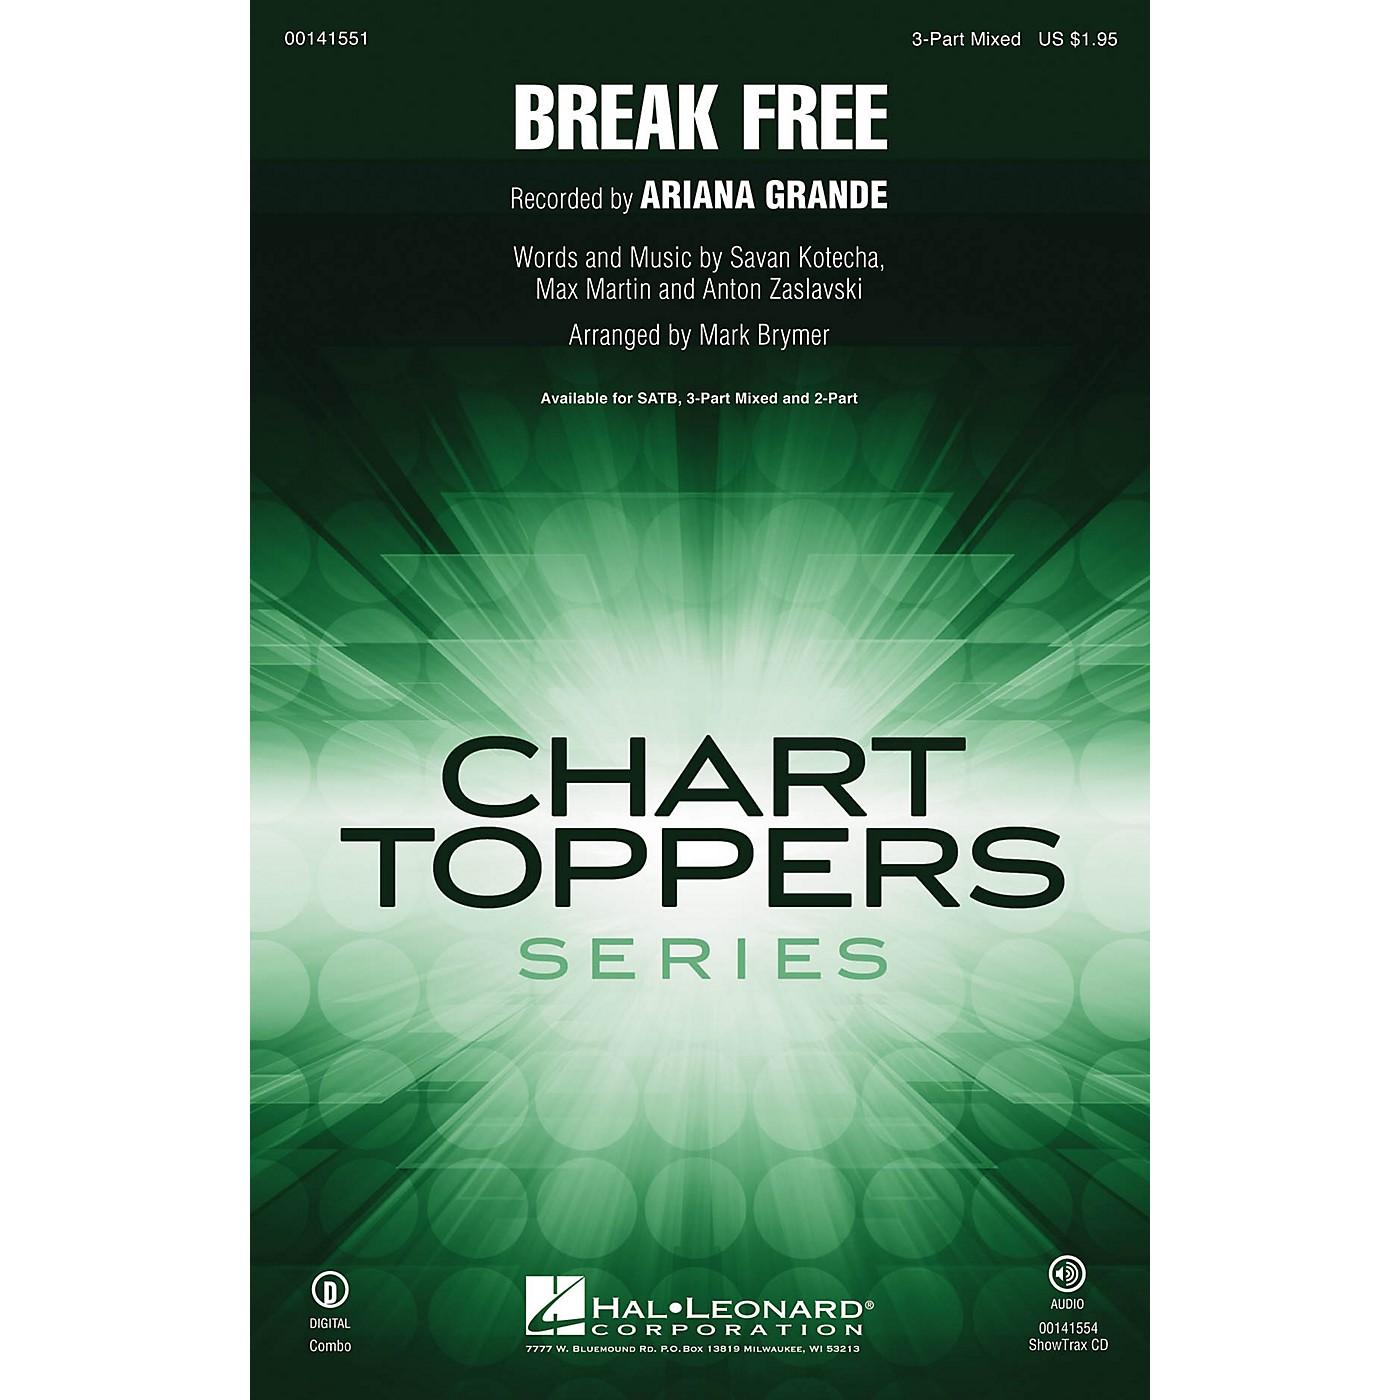 Hal Leonard Break Free 3-Part Mixed by Ariana Grande arranged by Mark Brymer thumbnail